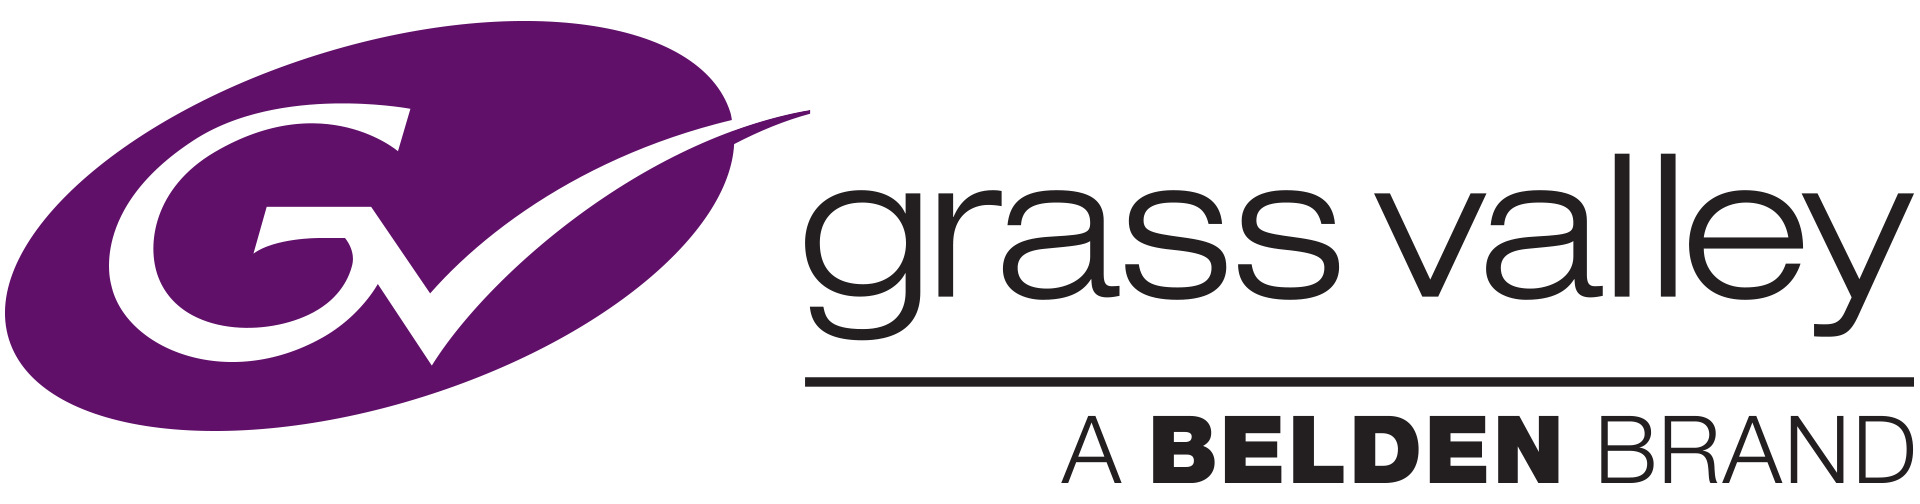 grassvalley-logo